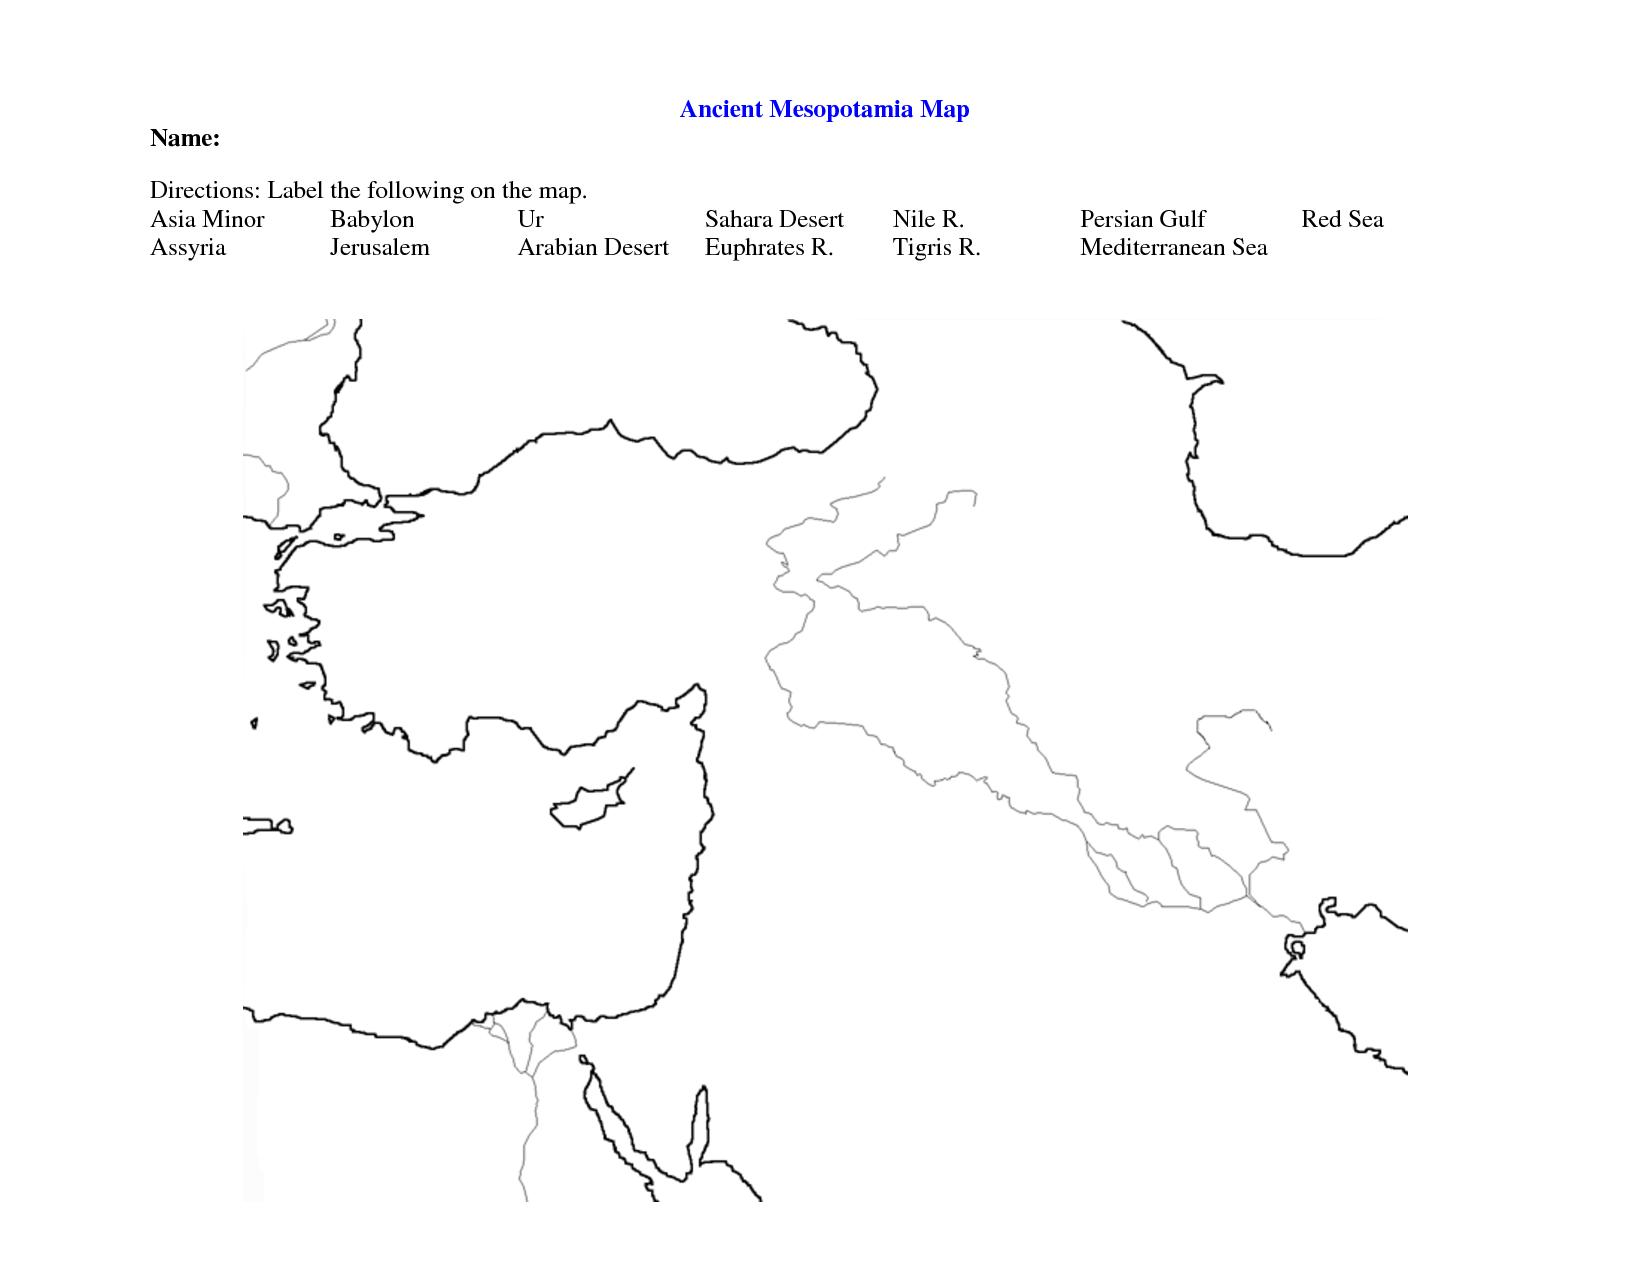 worksheet Different Kinds Of Maps Worksheet fertile crescent map worksheet google search world history 9 search